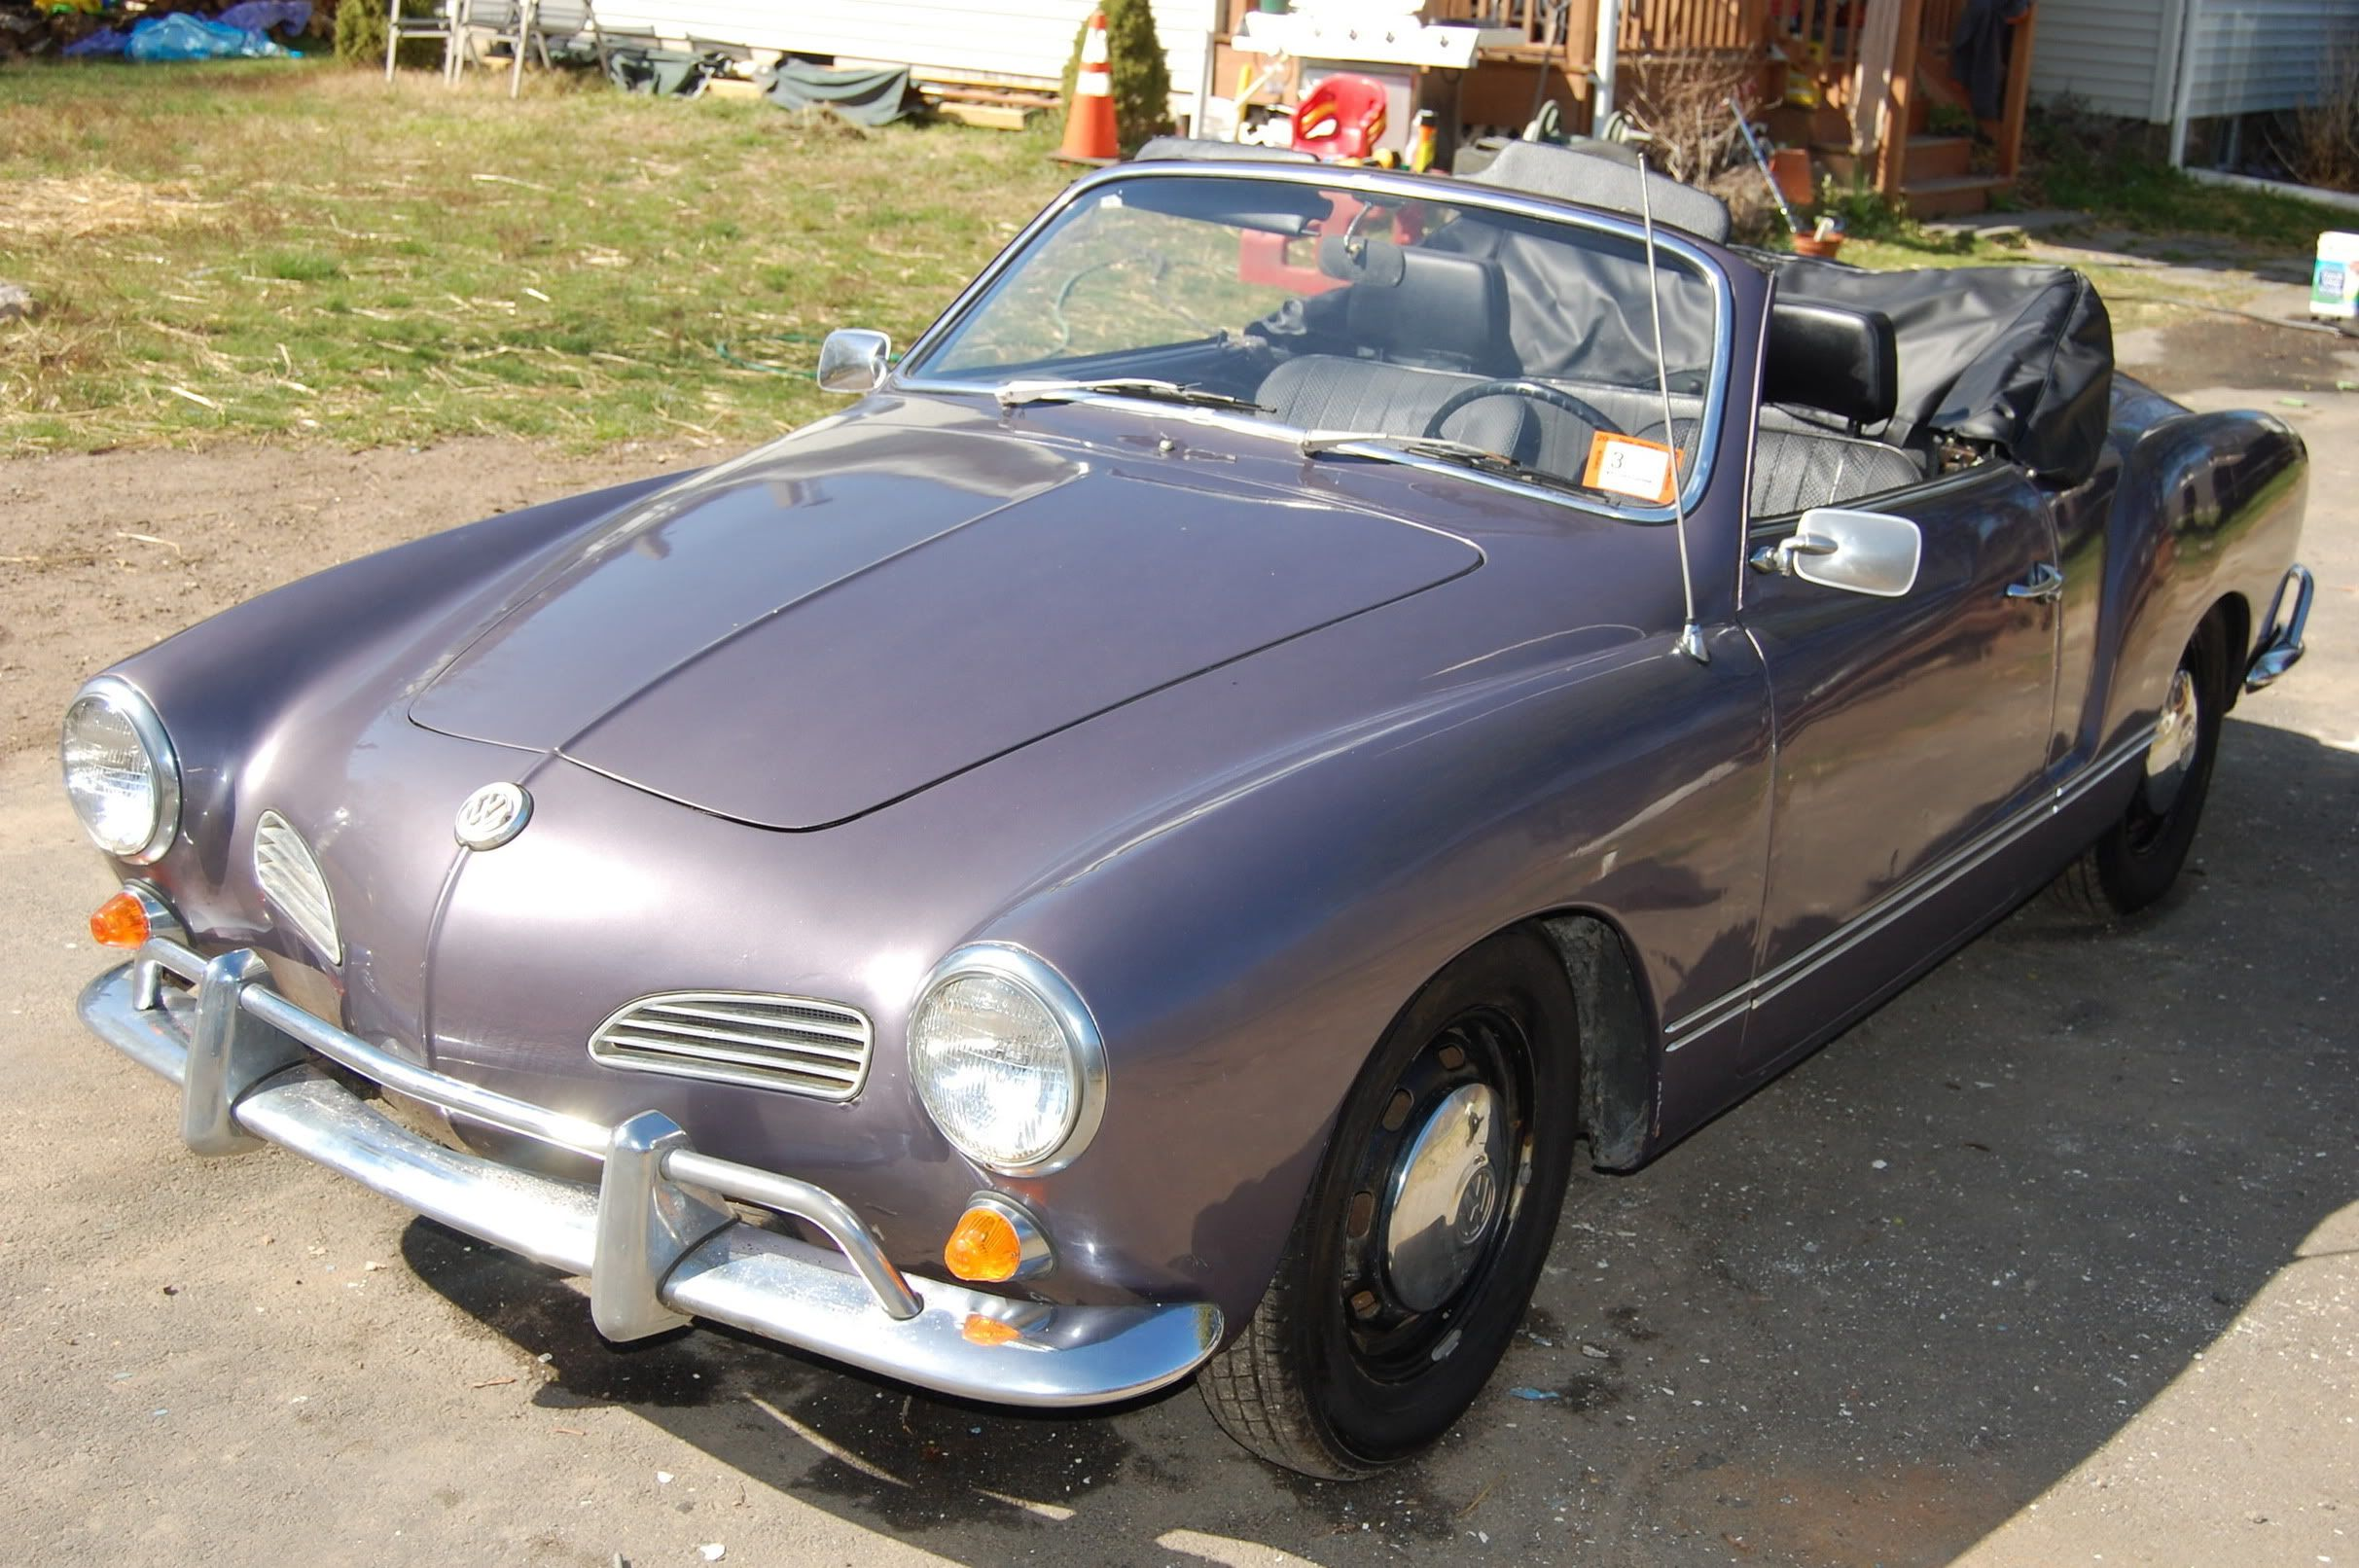 convertible htm c volkswagen l ghia for sale karmann